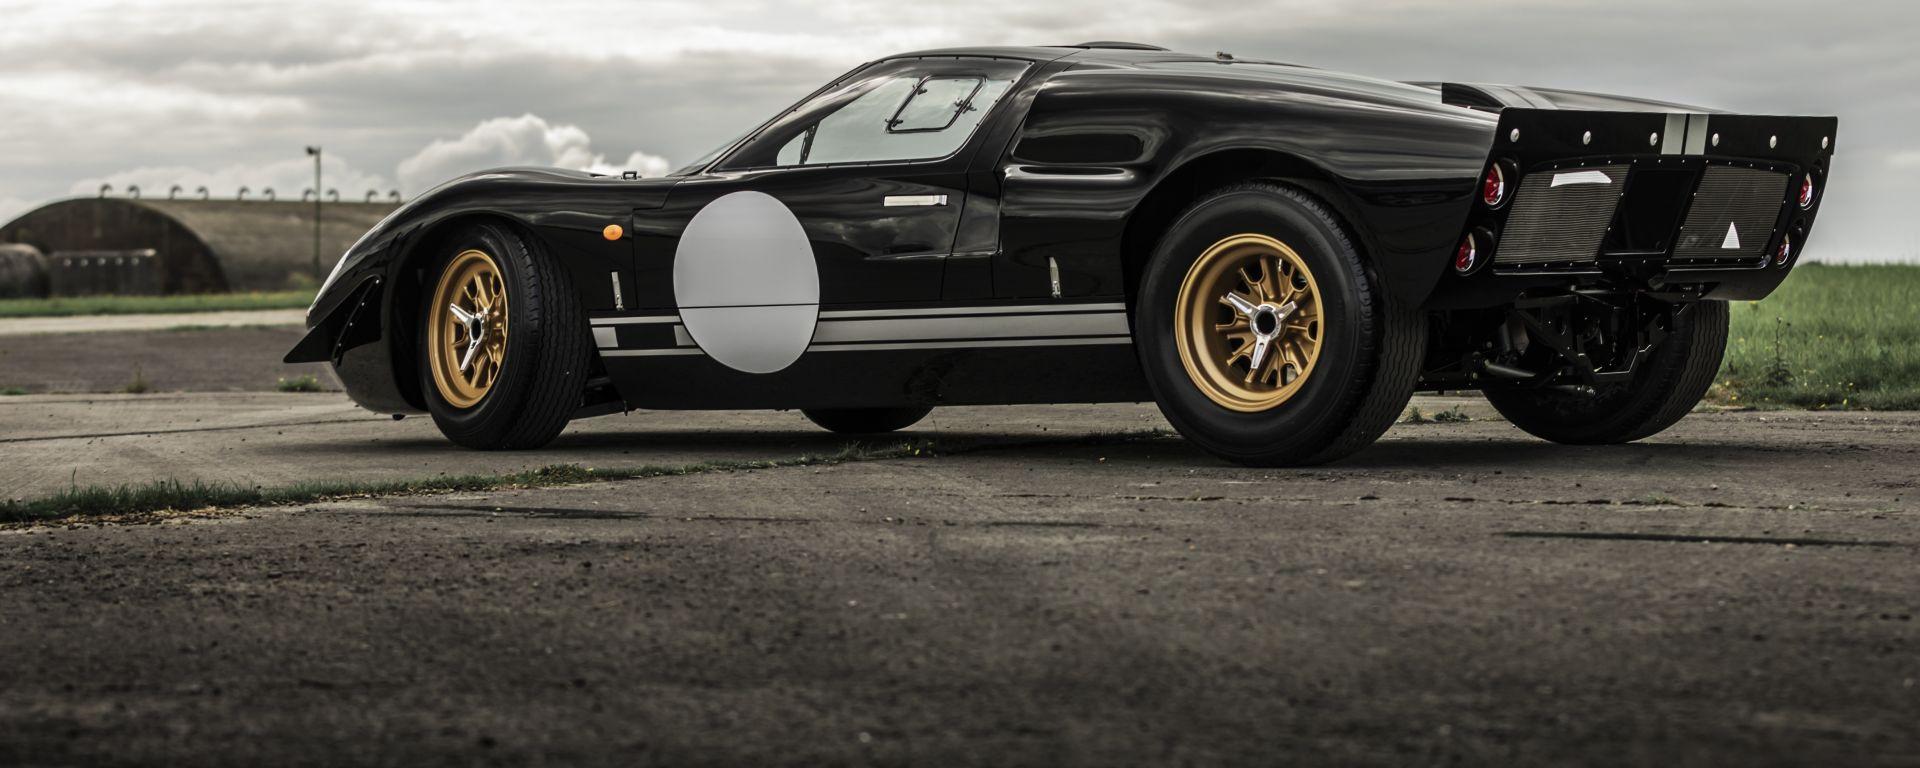 Superformance GT40 Everrati: 3/4 posteriore